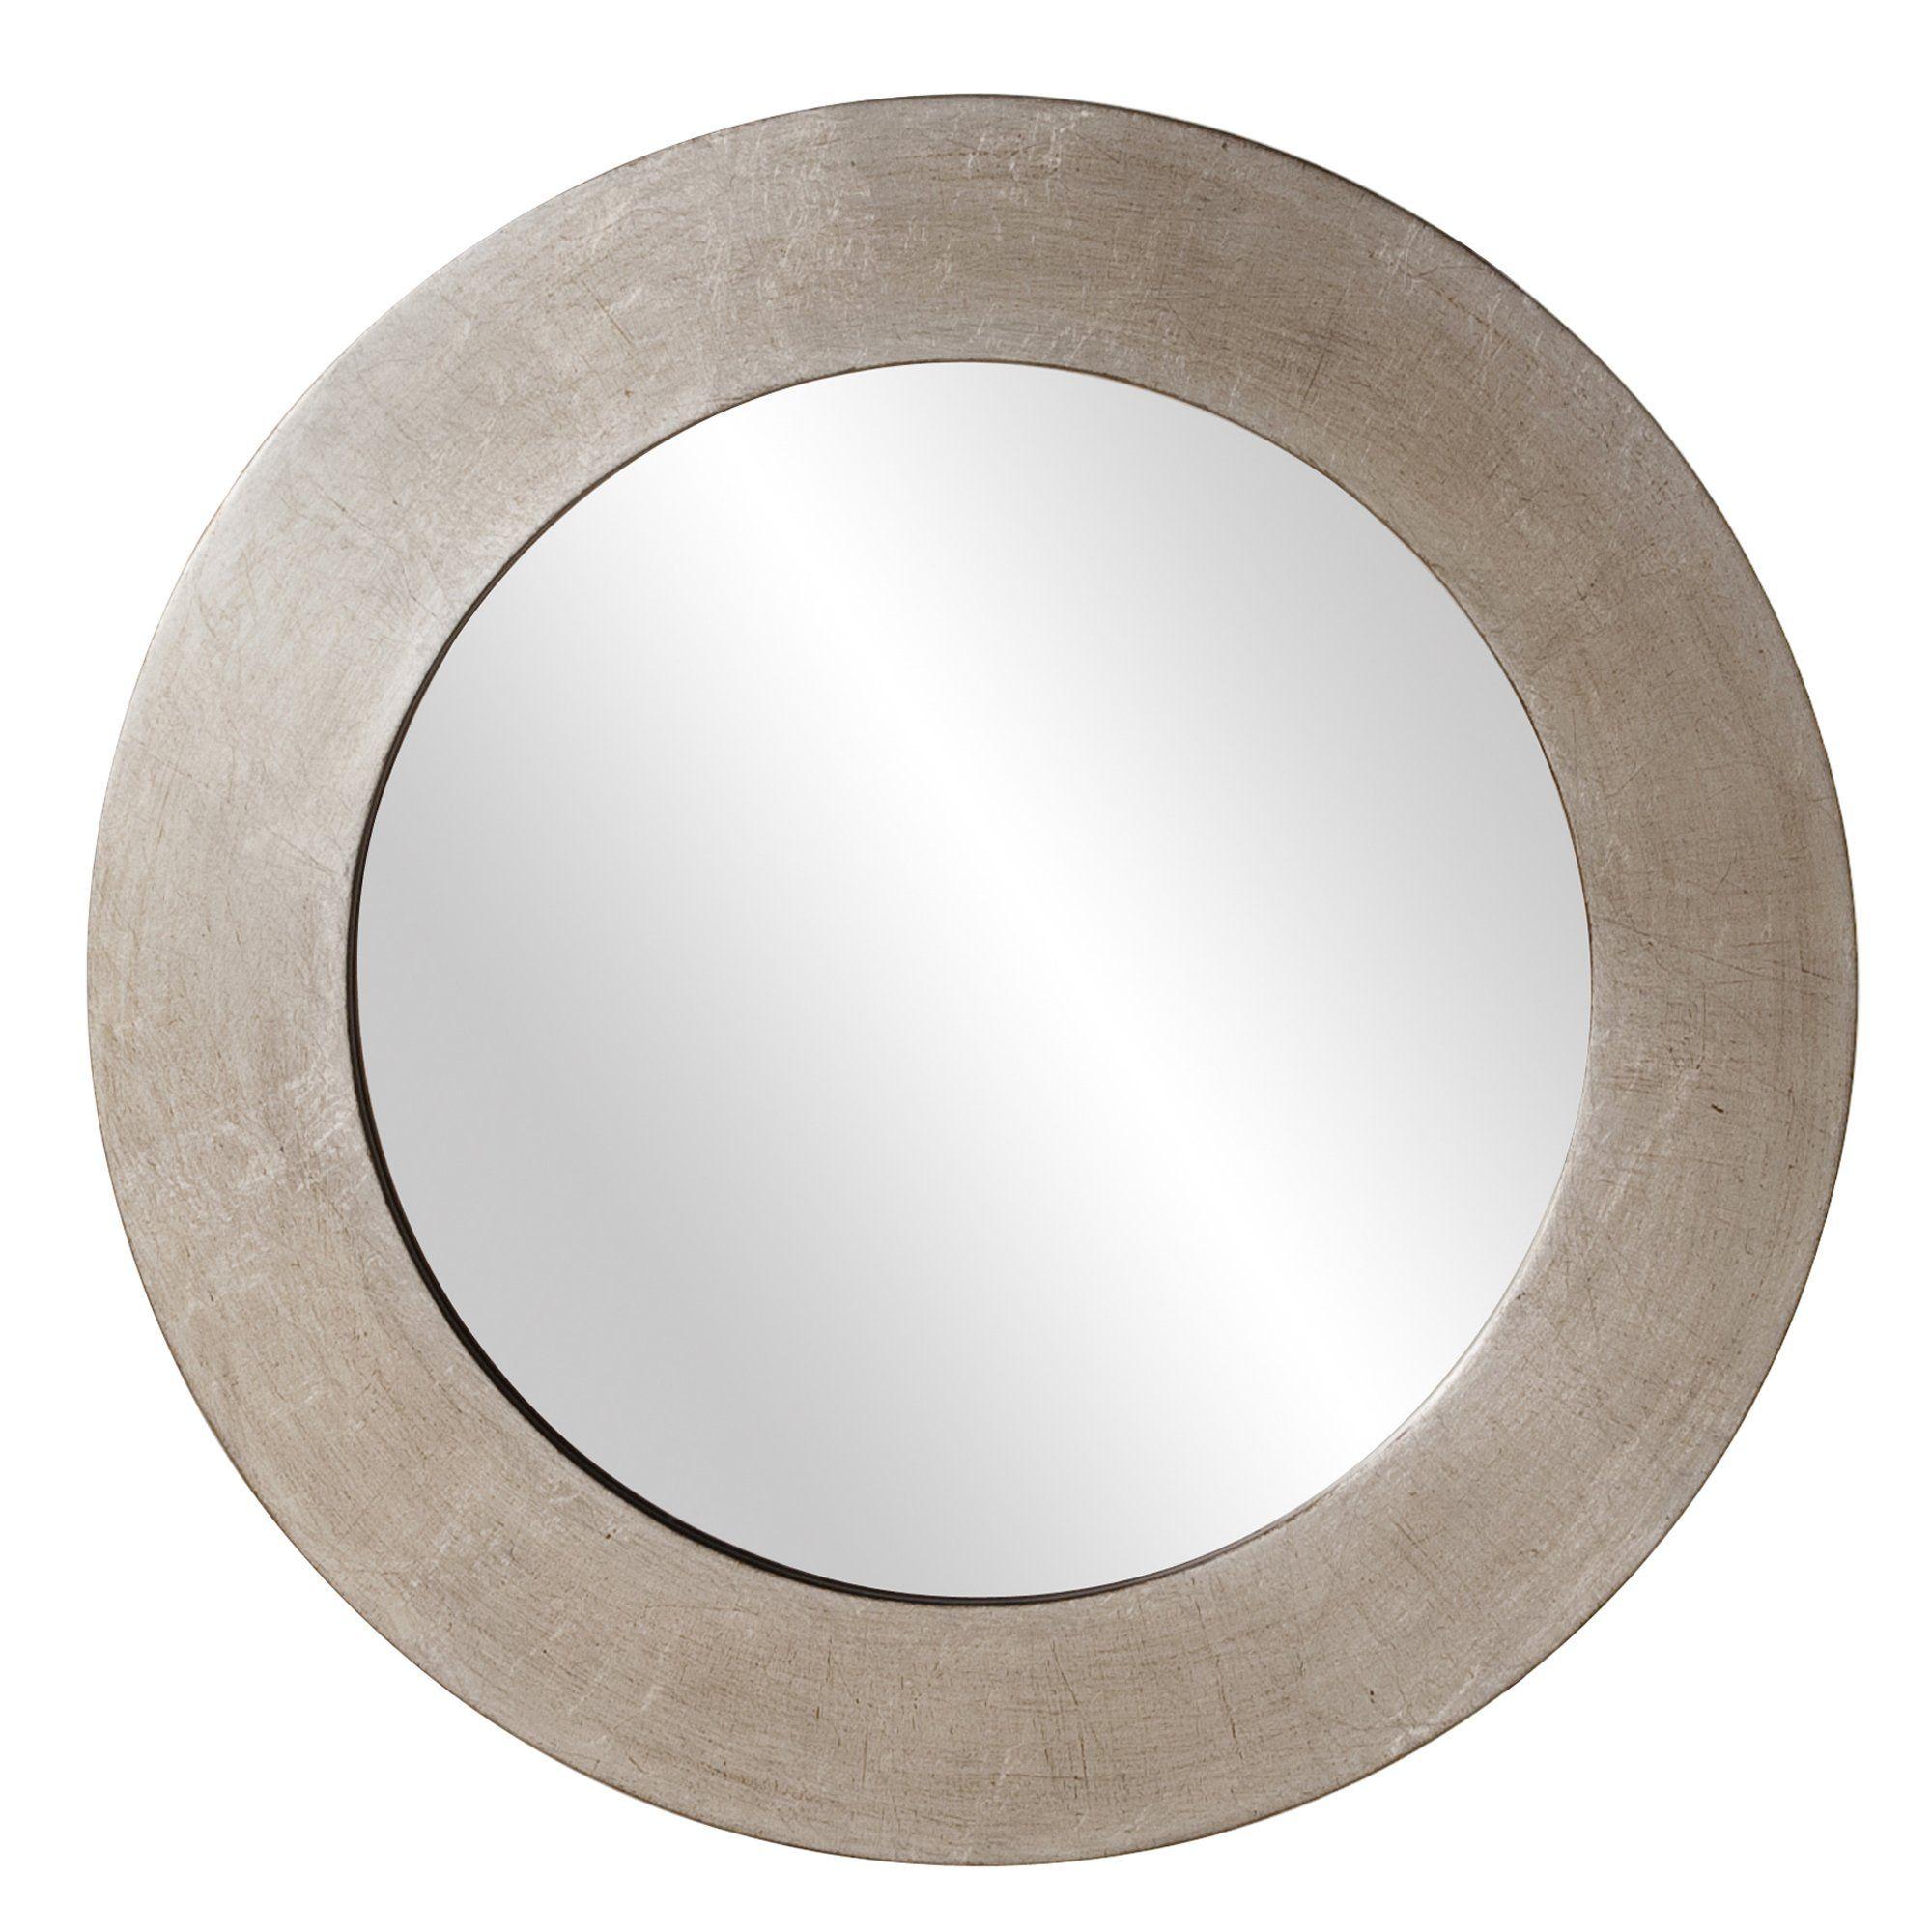 Amazon Com Howard Elliott 60200 Sonic Round Mirror 20 Inch Silver Leaf Wall Mounted Mirrors Contemporary Mirror Mirror Circular Mirror